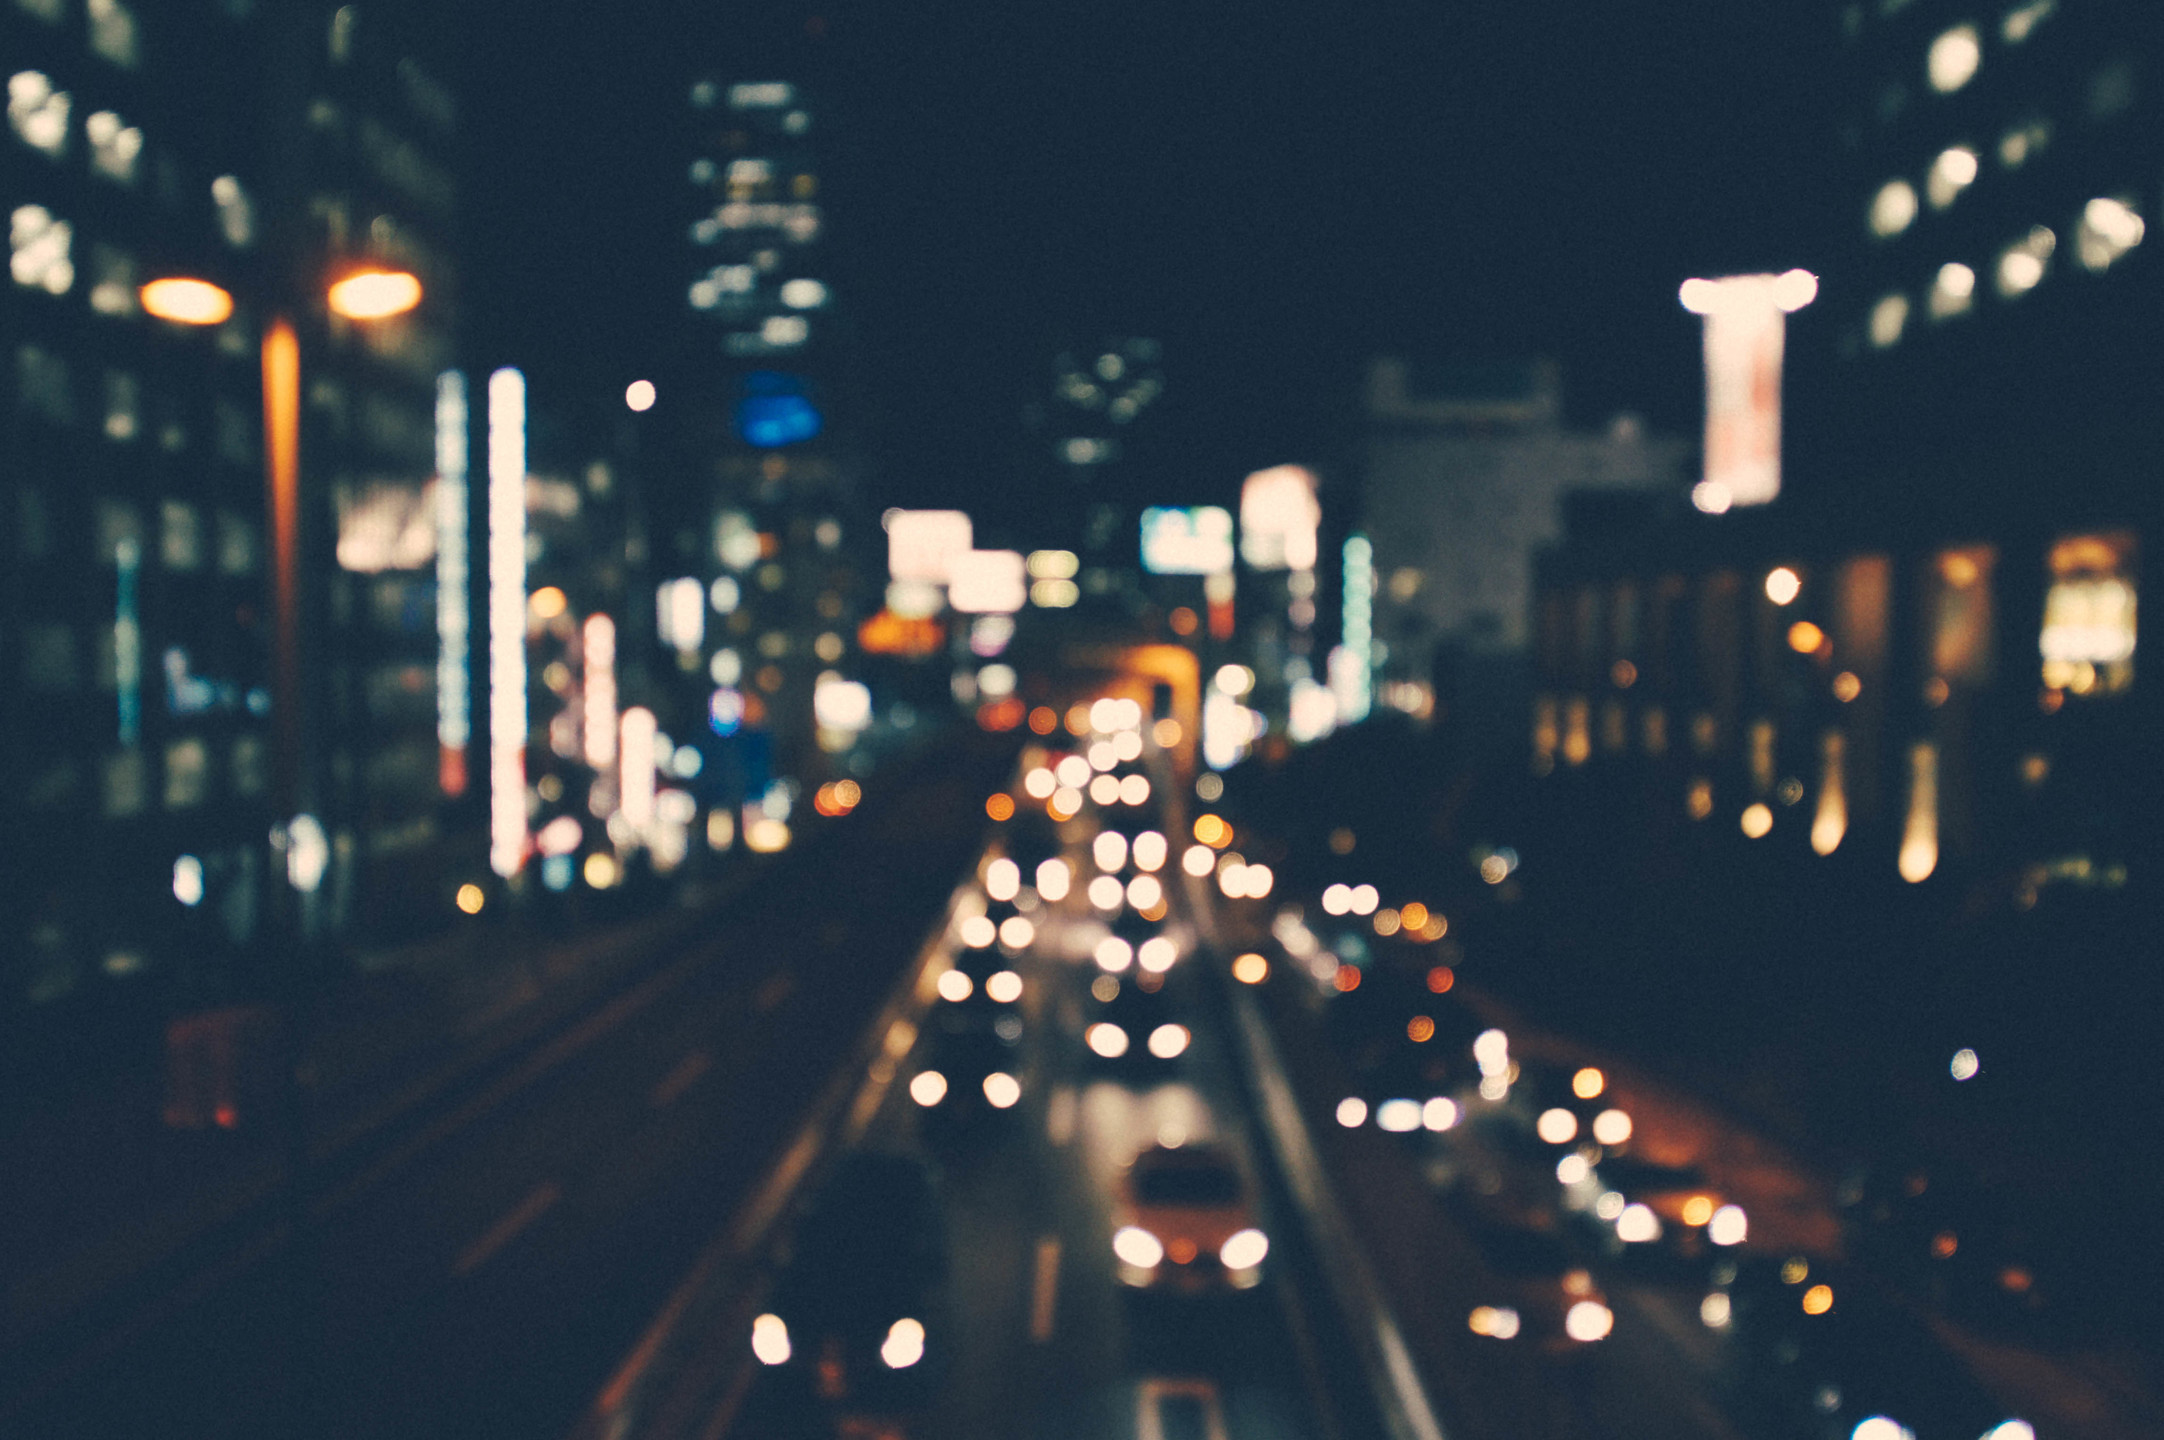 CITY STREET Photo by Israel Sundseth